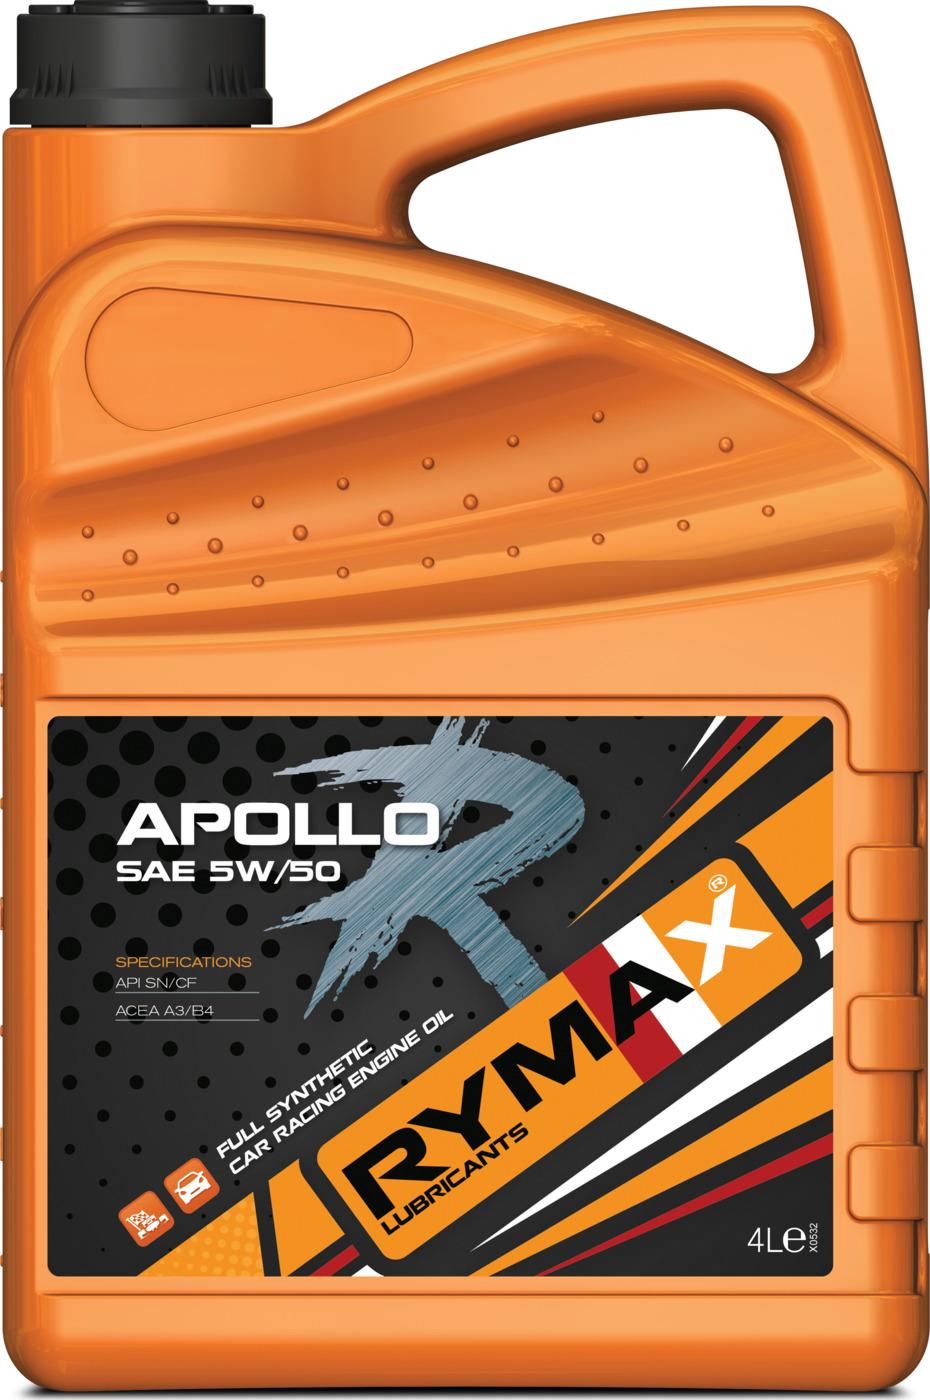 Моторное масло Rymax Apollo R SAE 5W-50, API SN/CF, ACEA A3/B4, спортивное на основе ПАО, 4 л